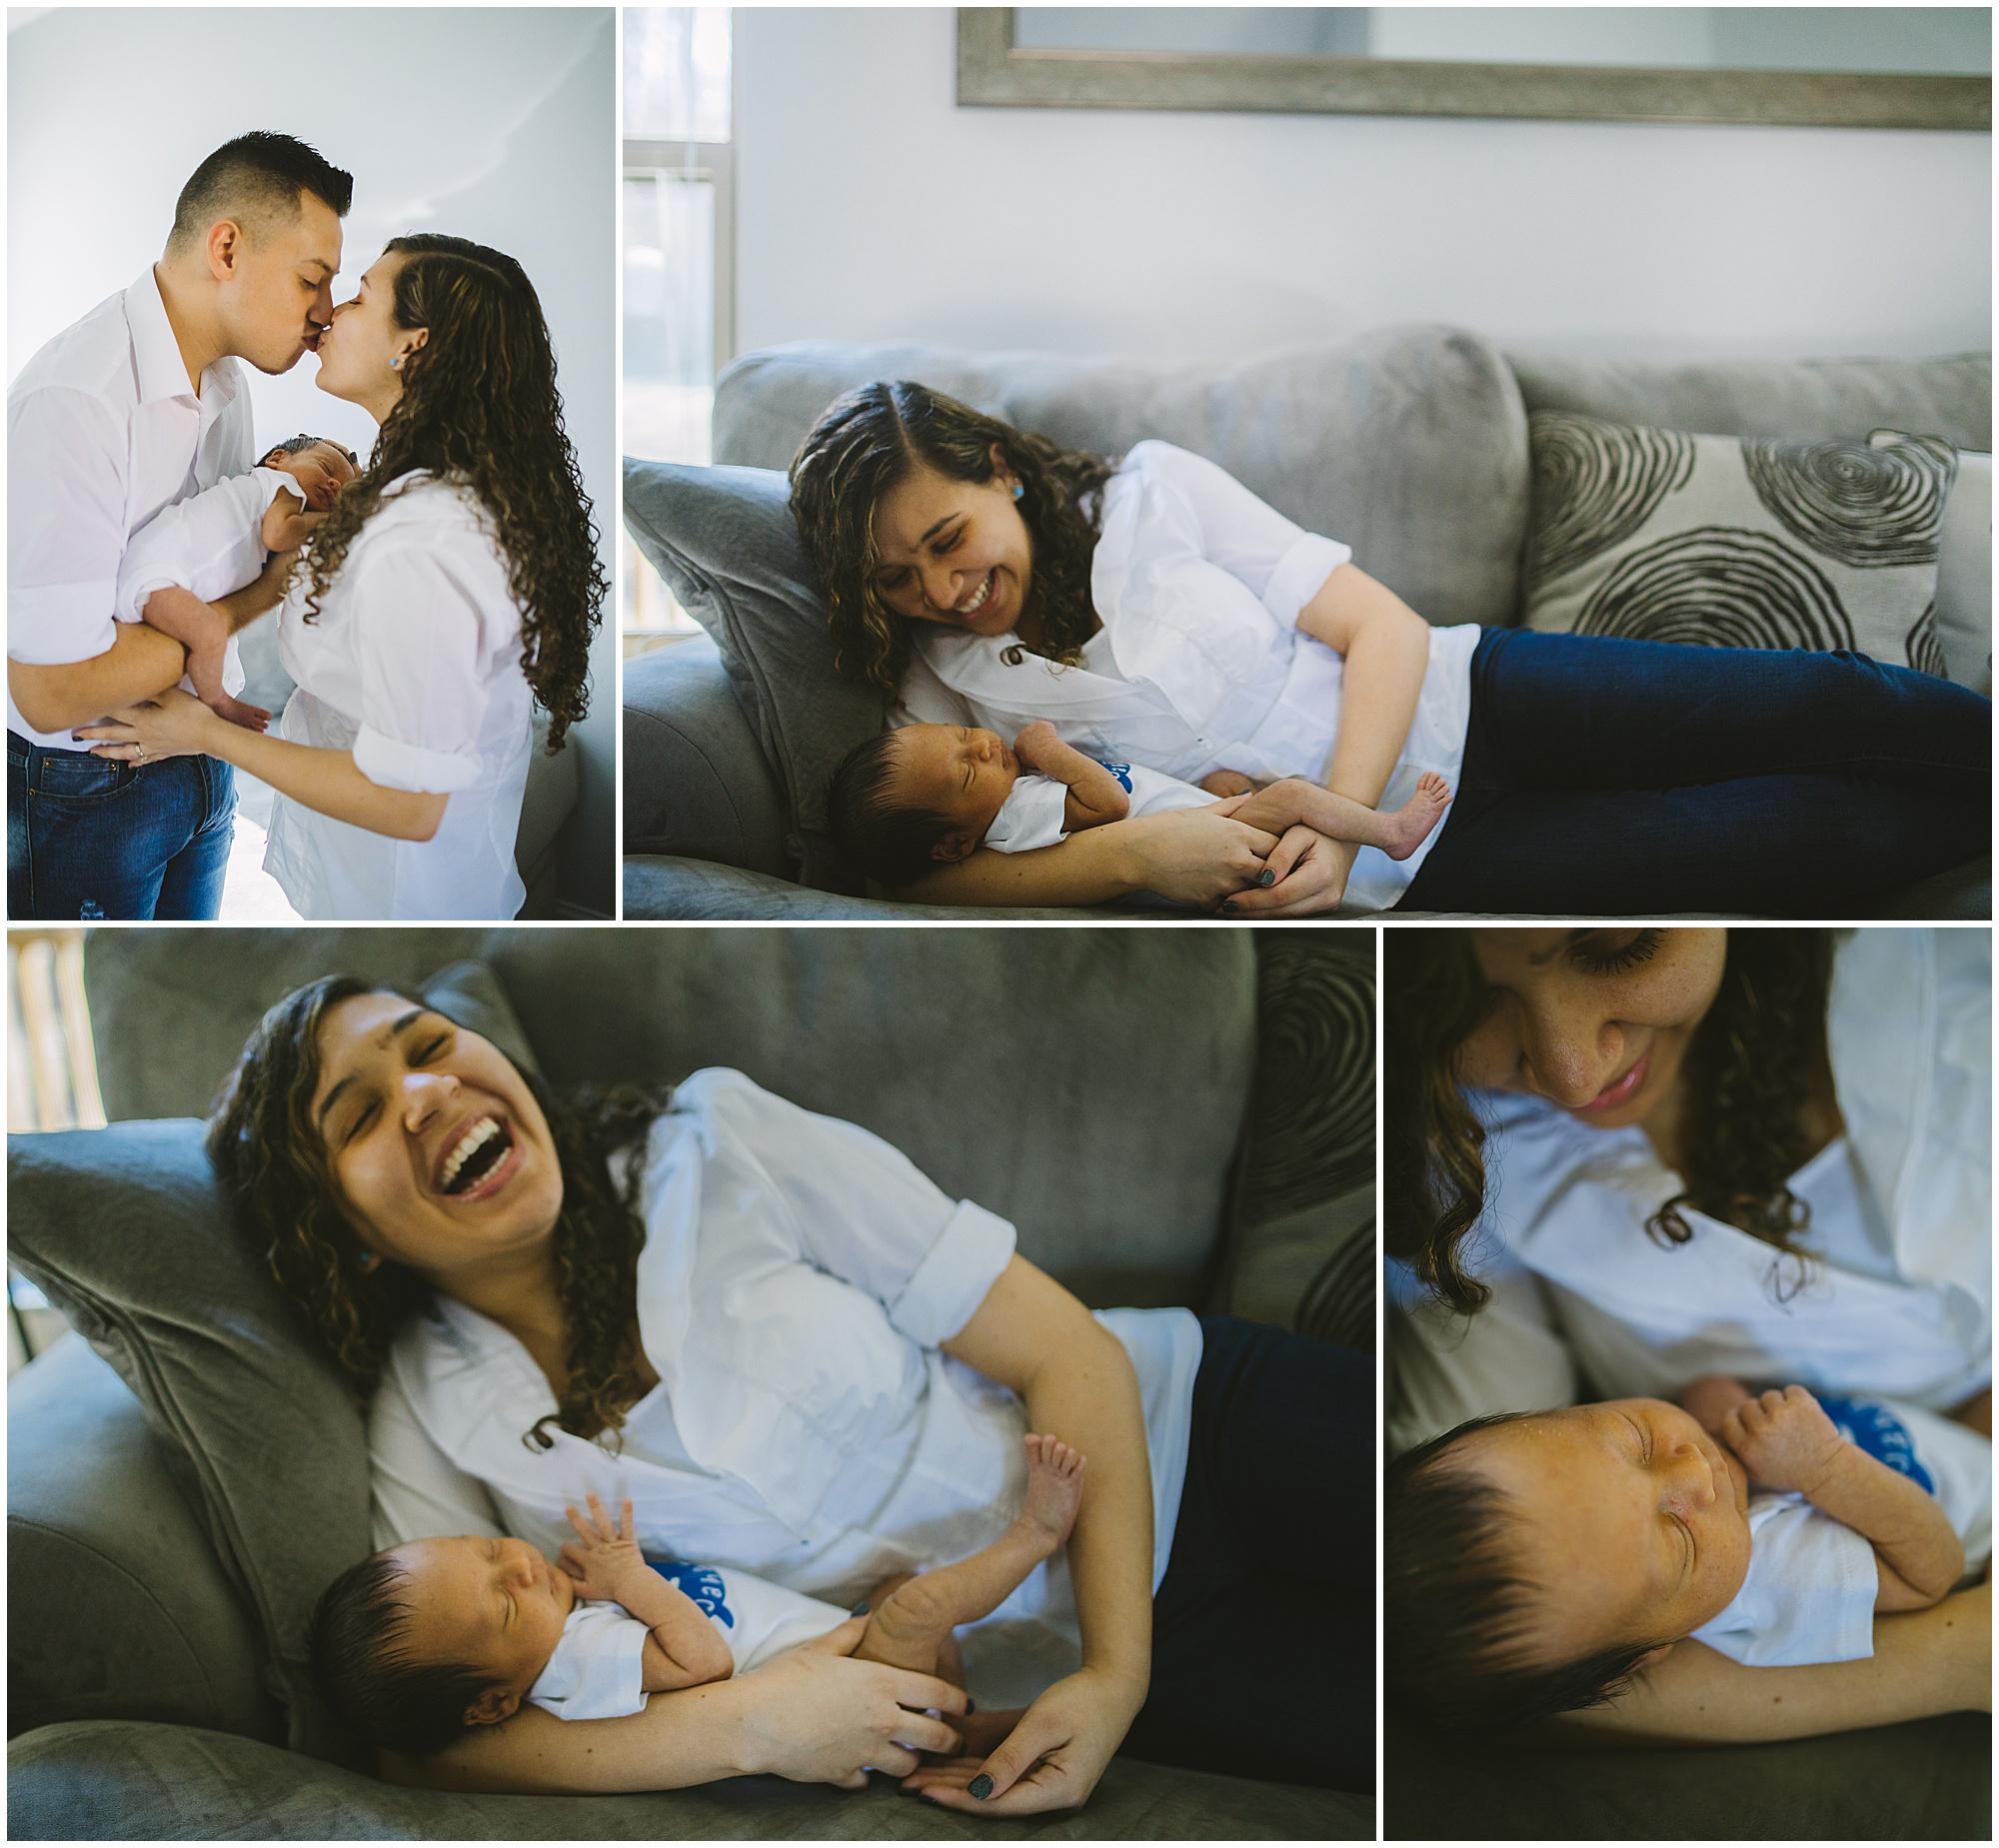 Emily-Lapish-Photo-Film-documentary-newborn-session_0009.jpg